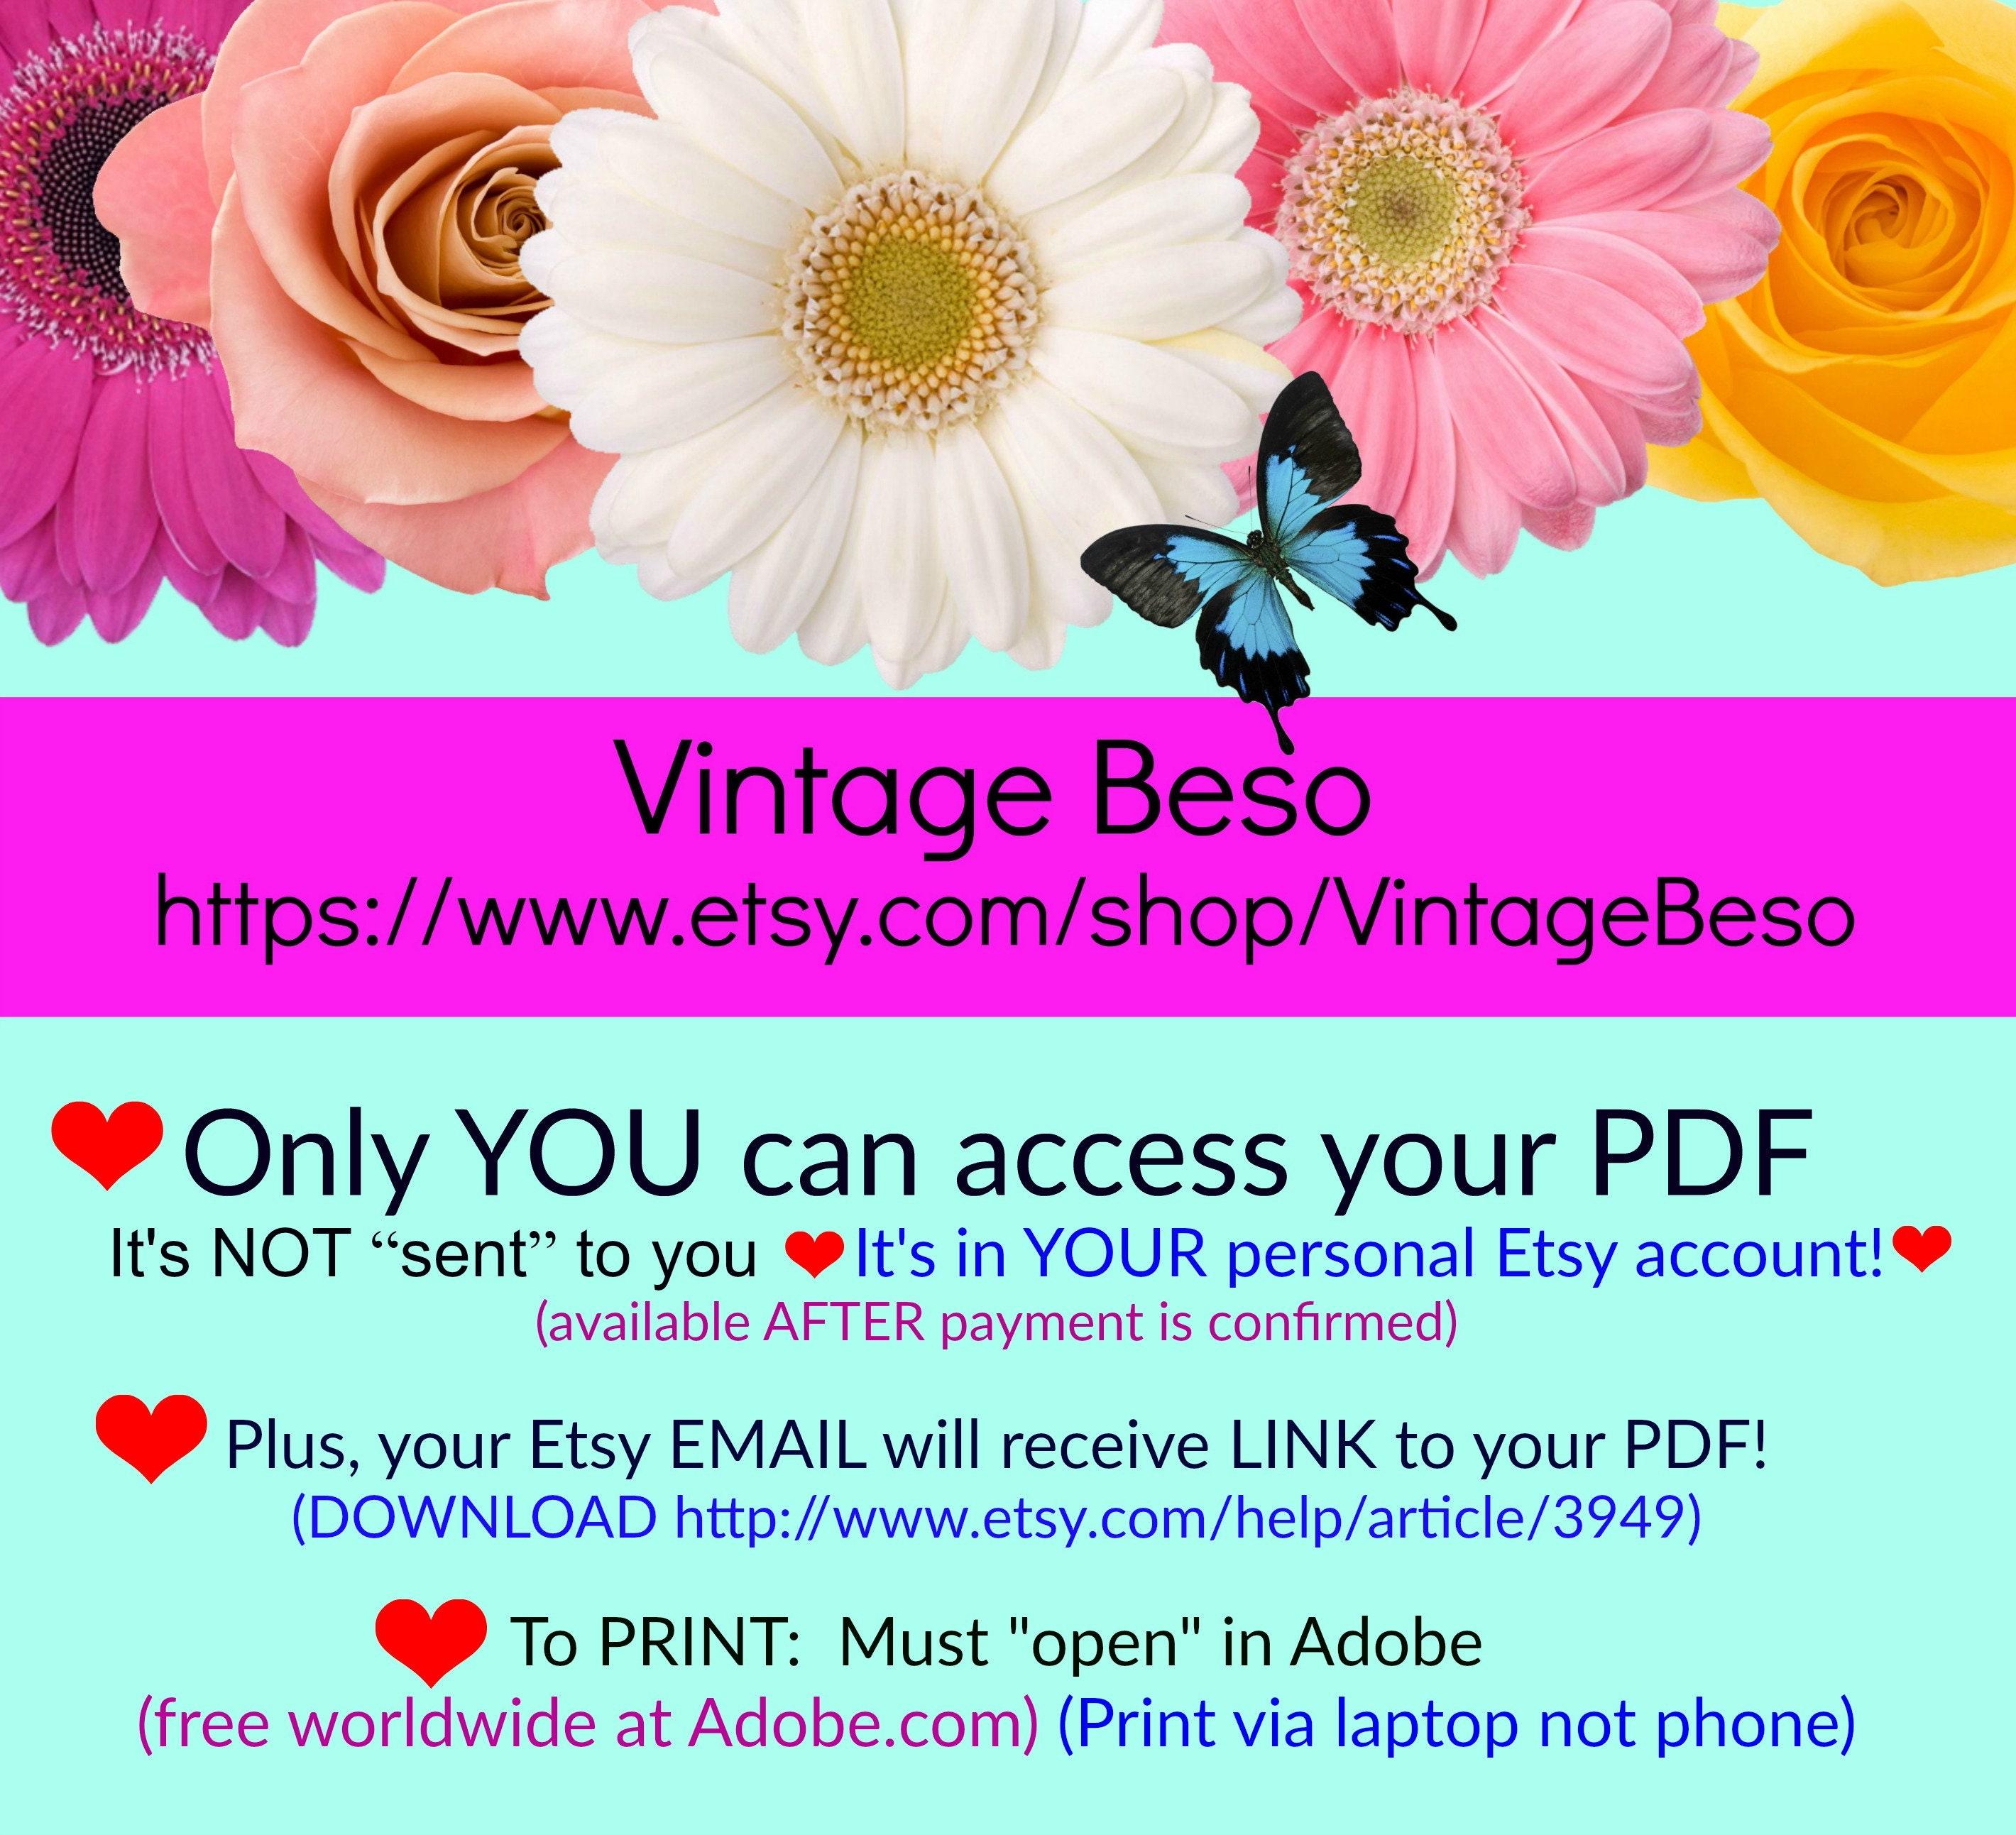 Boho Top Crochet Pattern \u2022 PDF PATTERN \u2022 Ladies Boho Starfish Sweater \u2022 1970s Vintage 100/% Boho Beauty \u2022 Feminine \u2022 Hippie Chic Lady